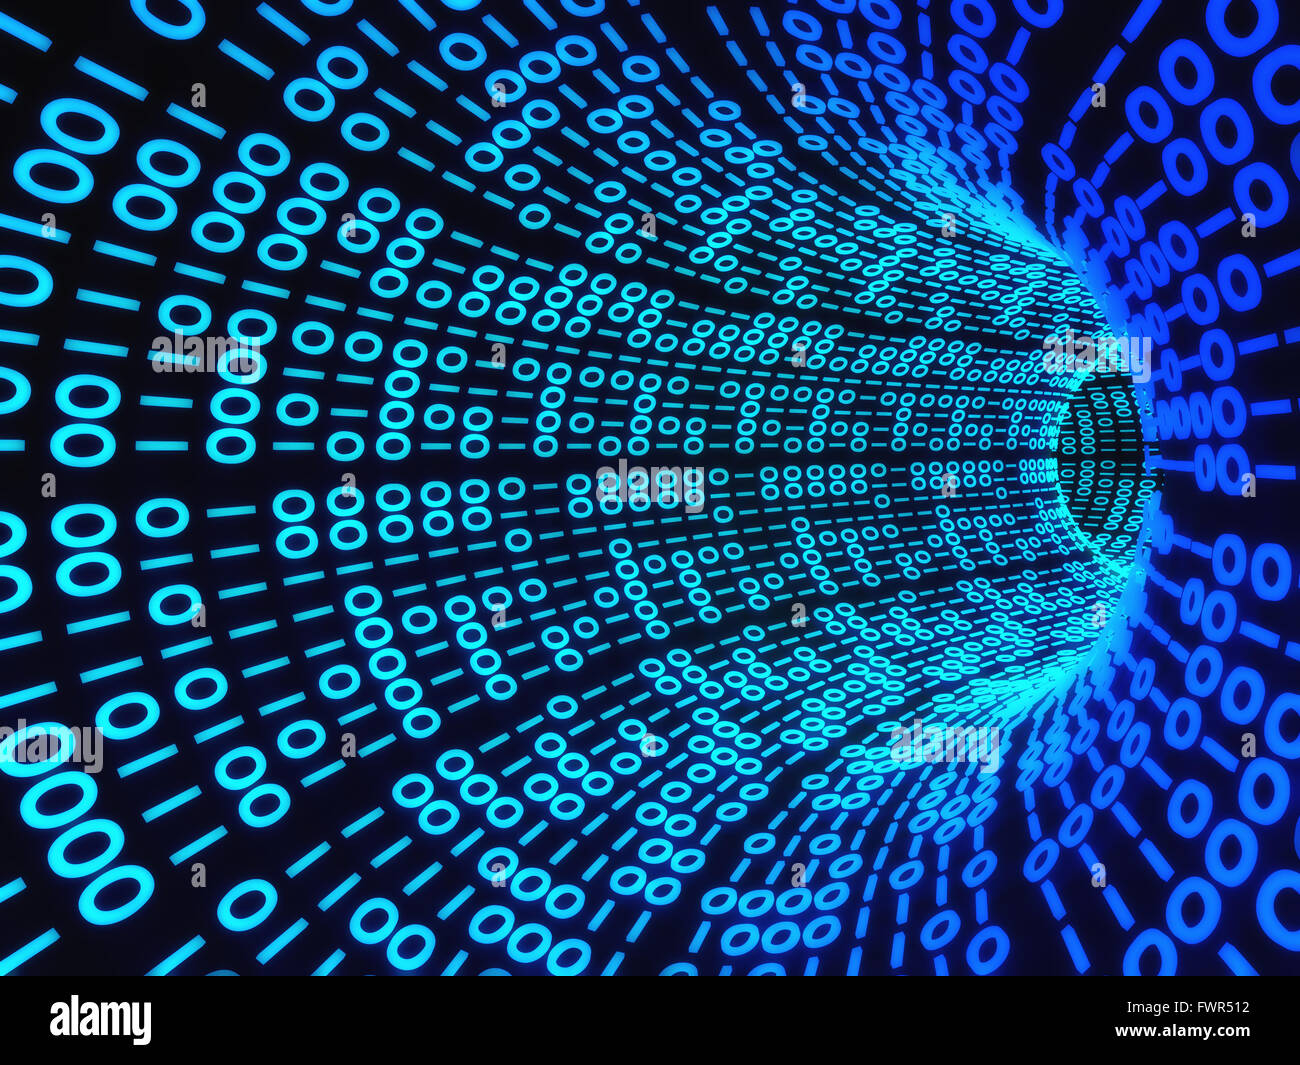 3d Tunnel Wallpaper Twisting Tunnel Of Digital Binary Computer Code Stock